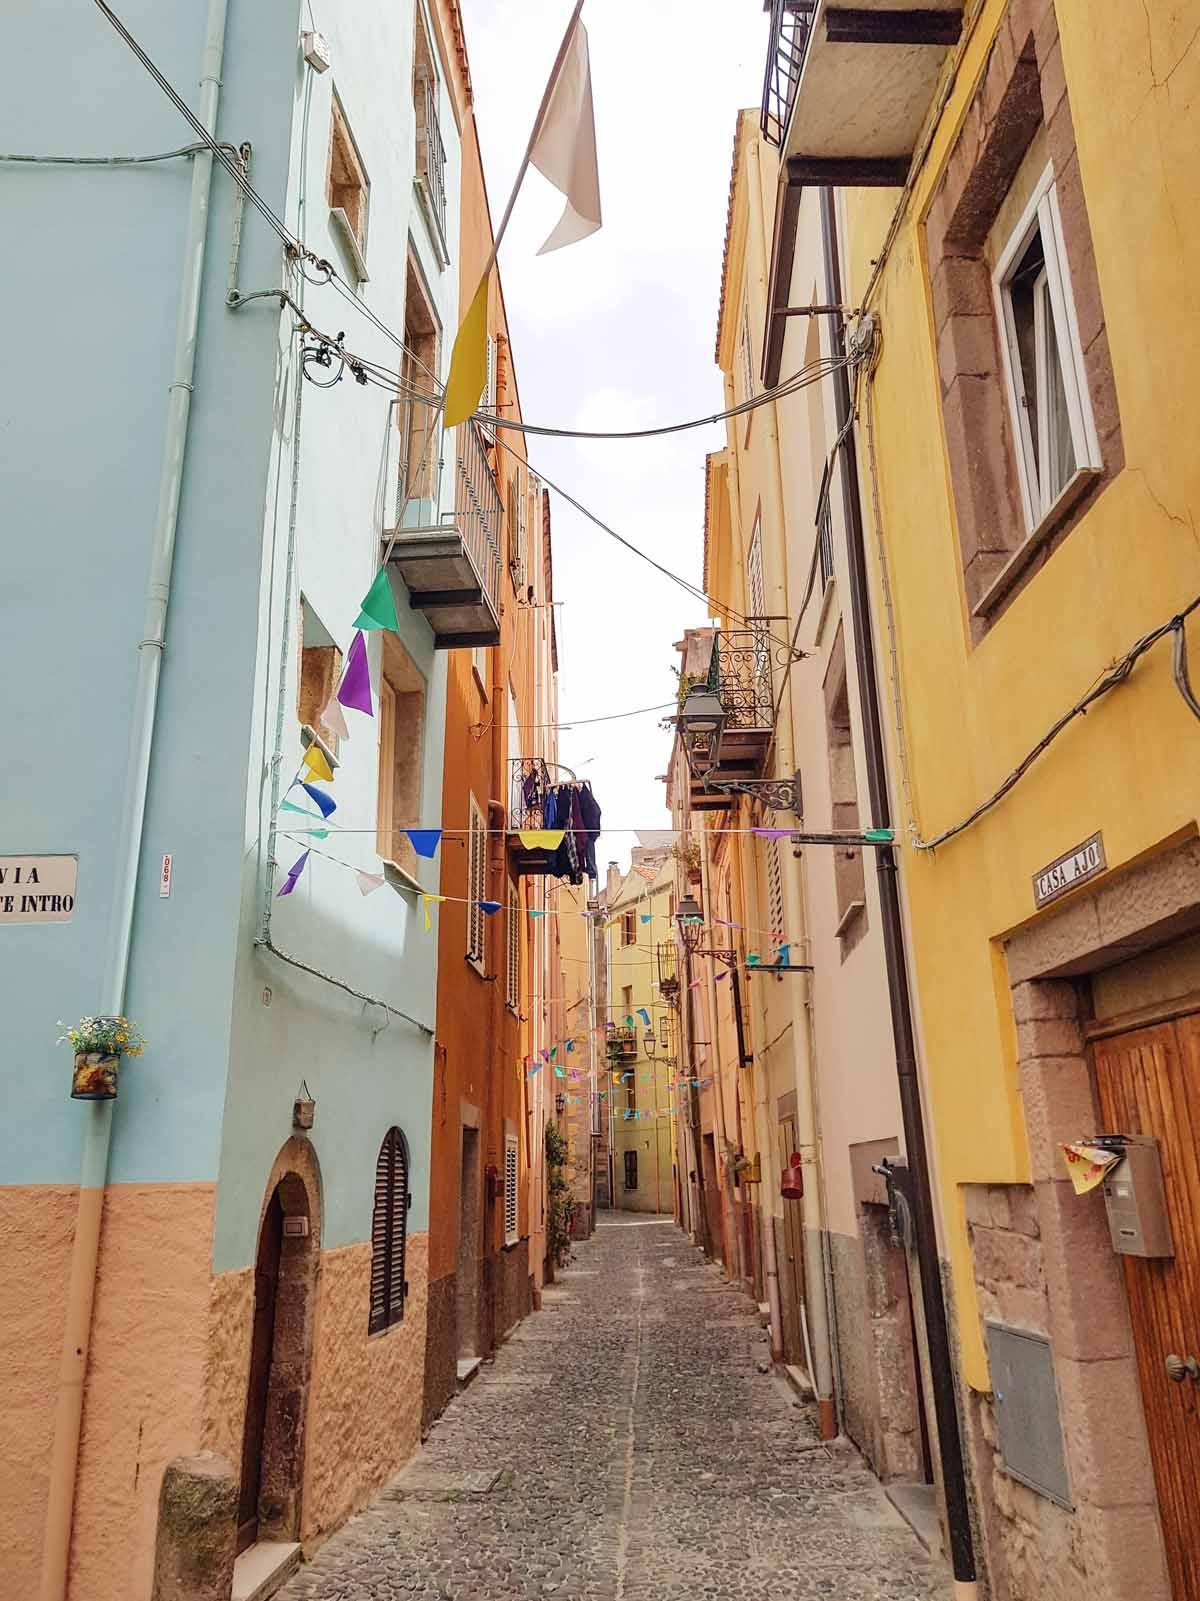 De mooiste plekken van Noord-Sardinië [roadtrip route], Bosa - Map of Joy